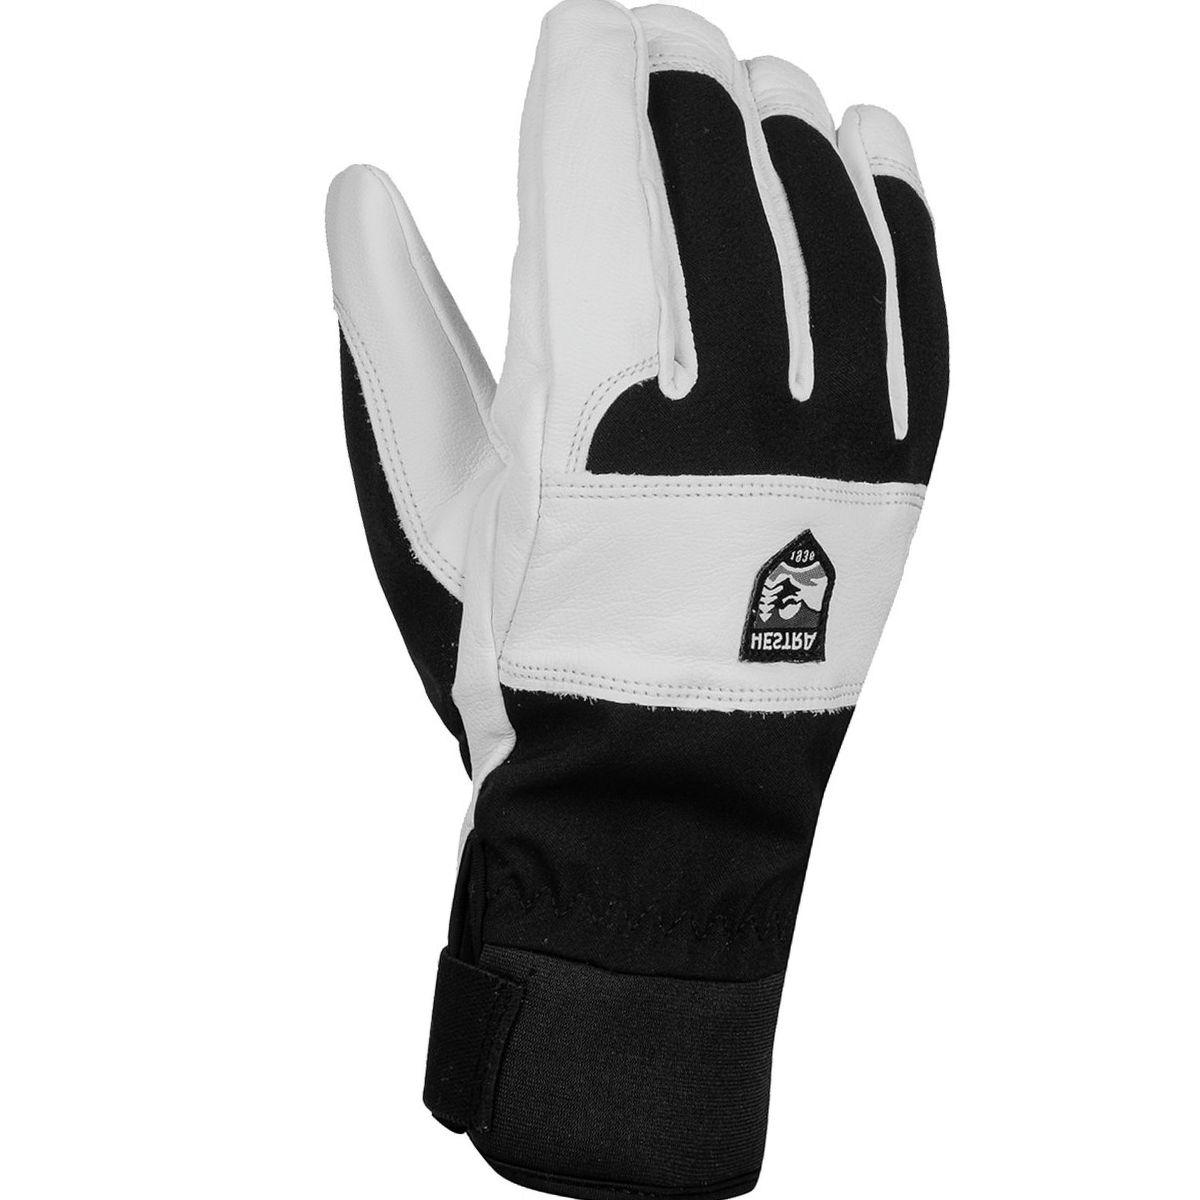 Hestra Vernum Glove - Men's